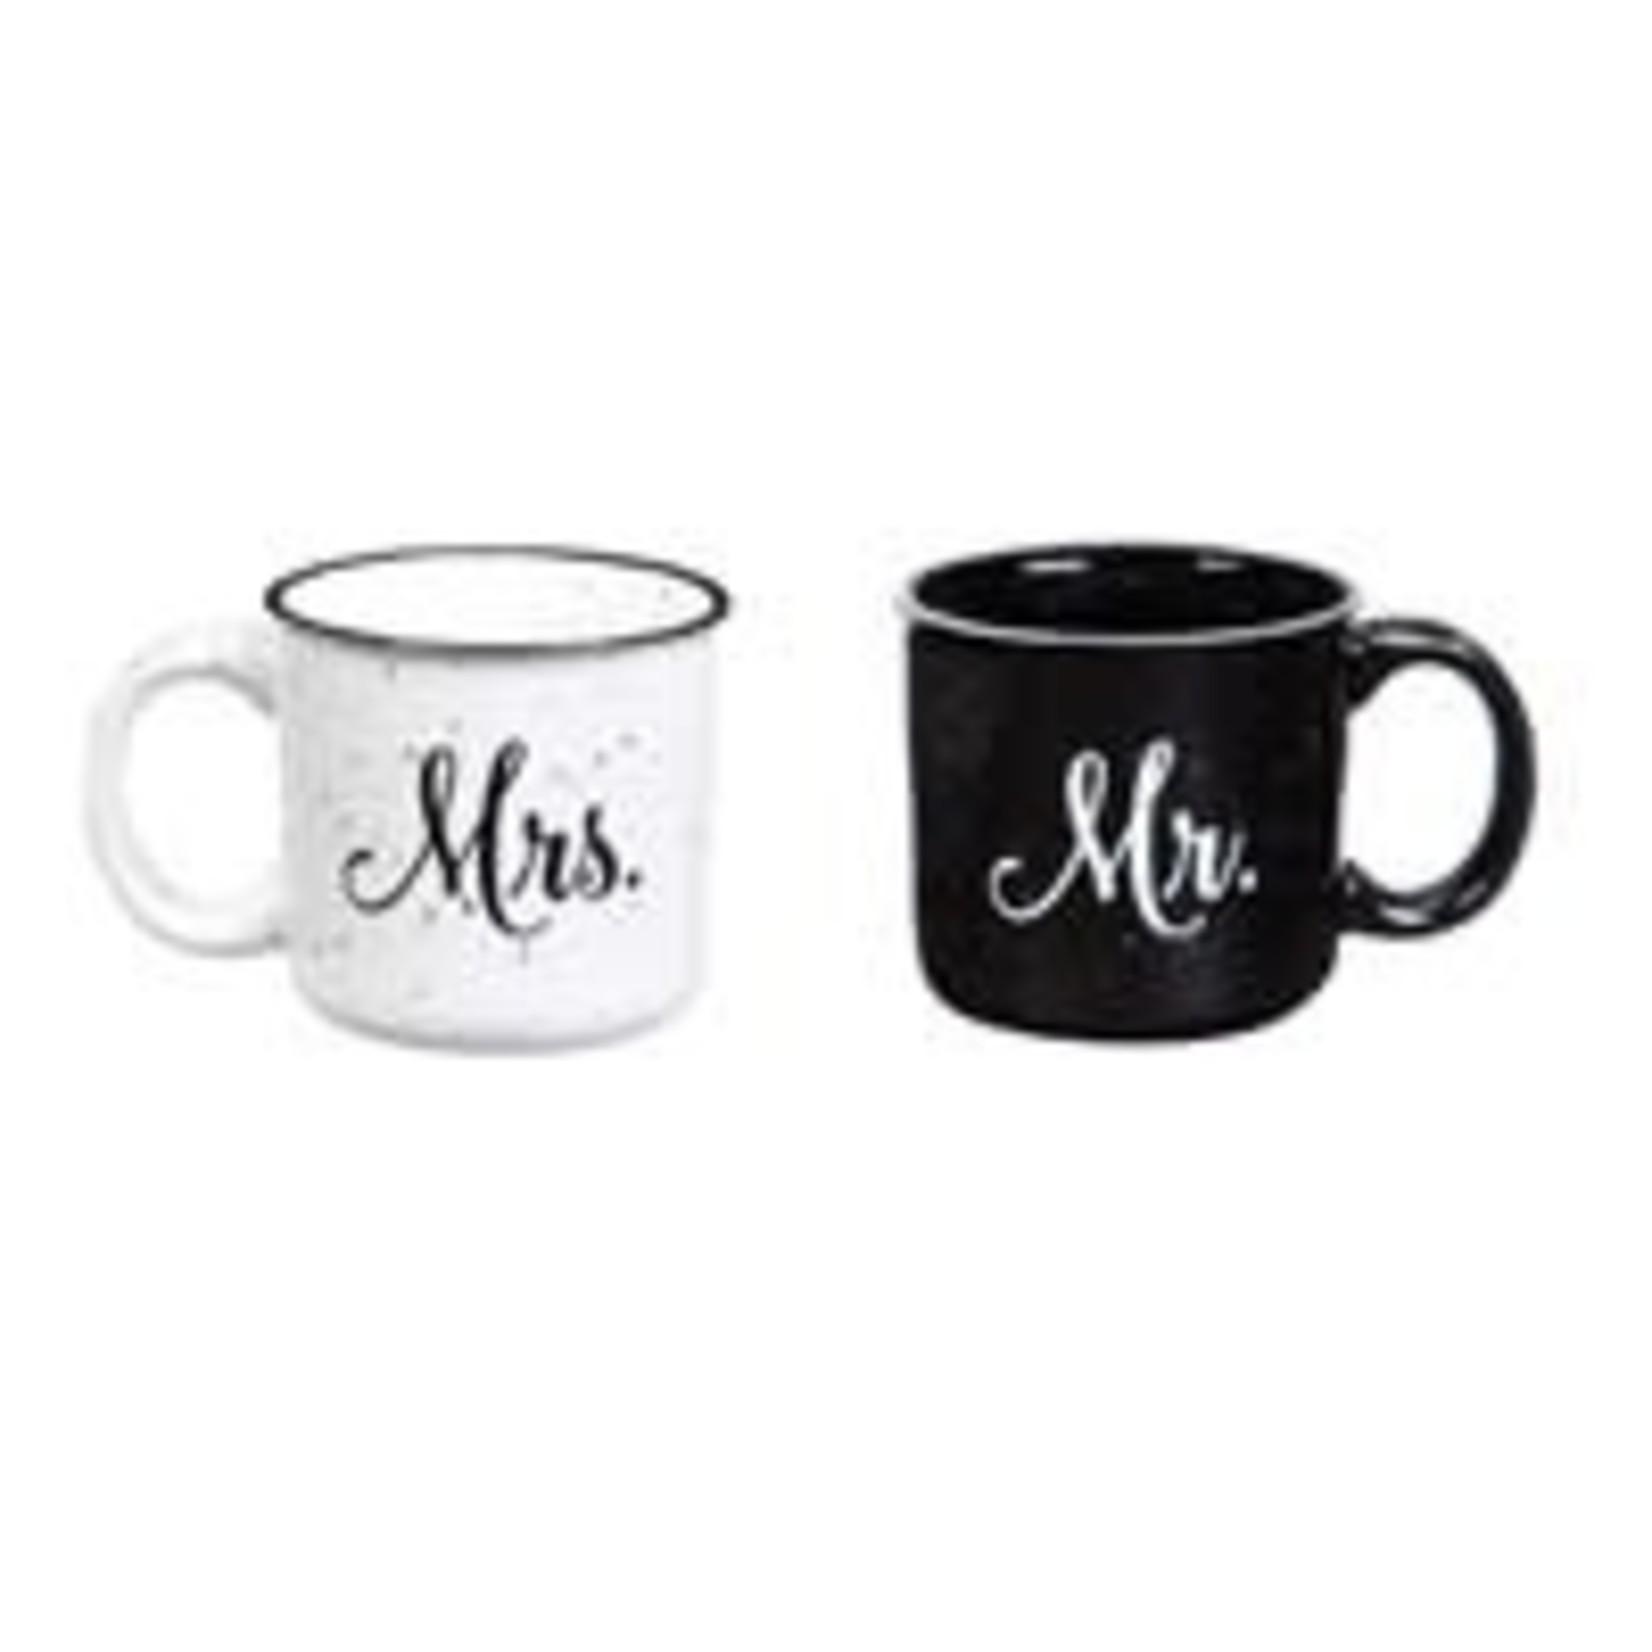 EVERGREEN Mr & Mrs. Mugs